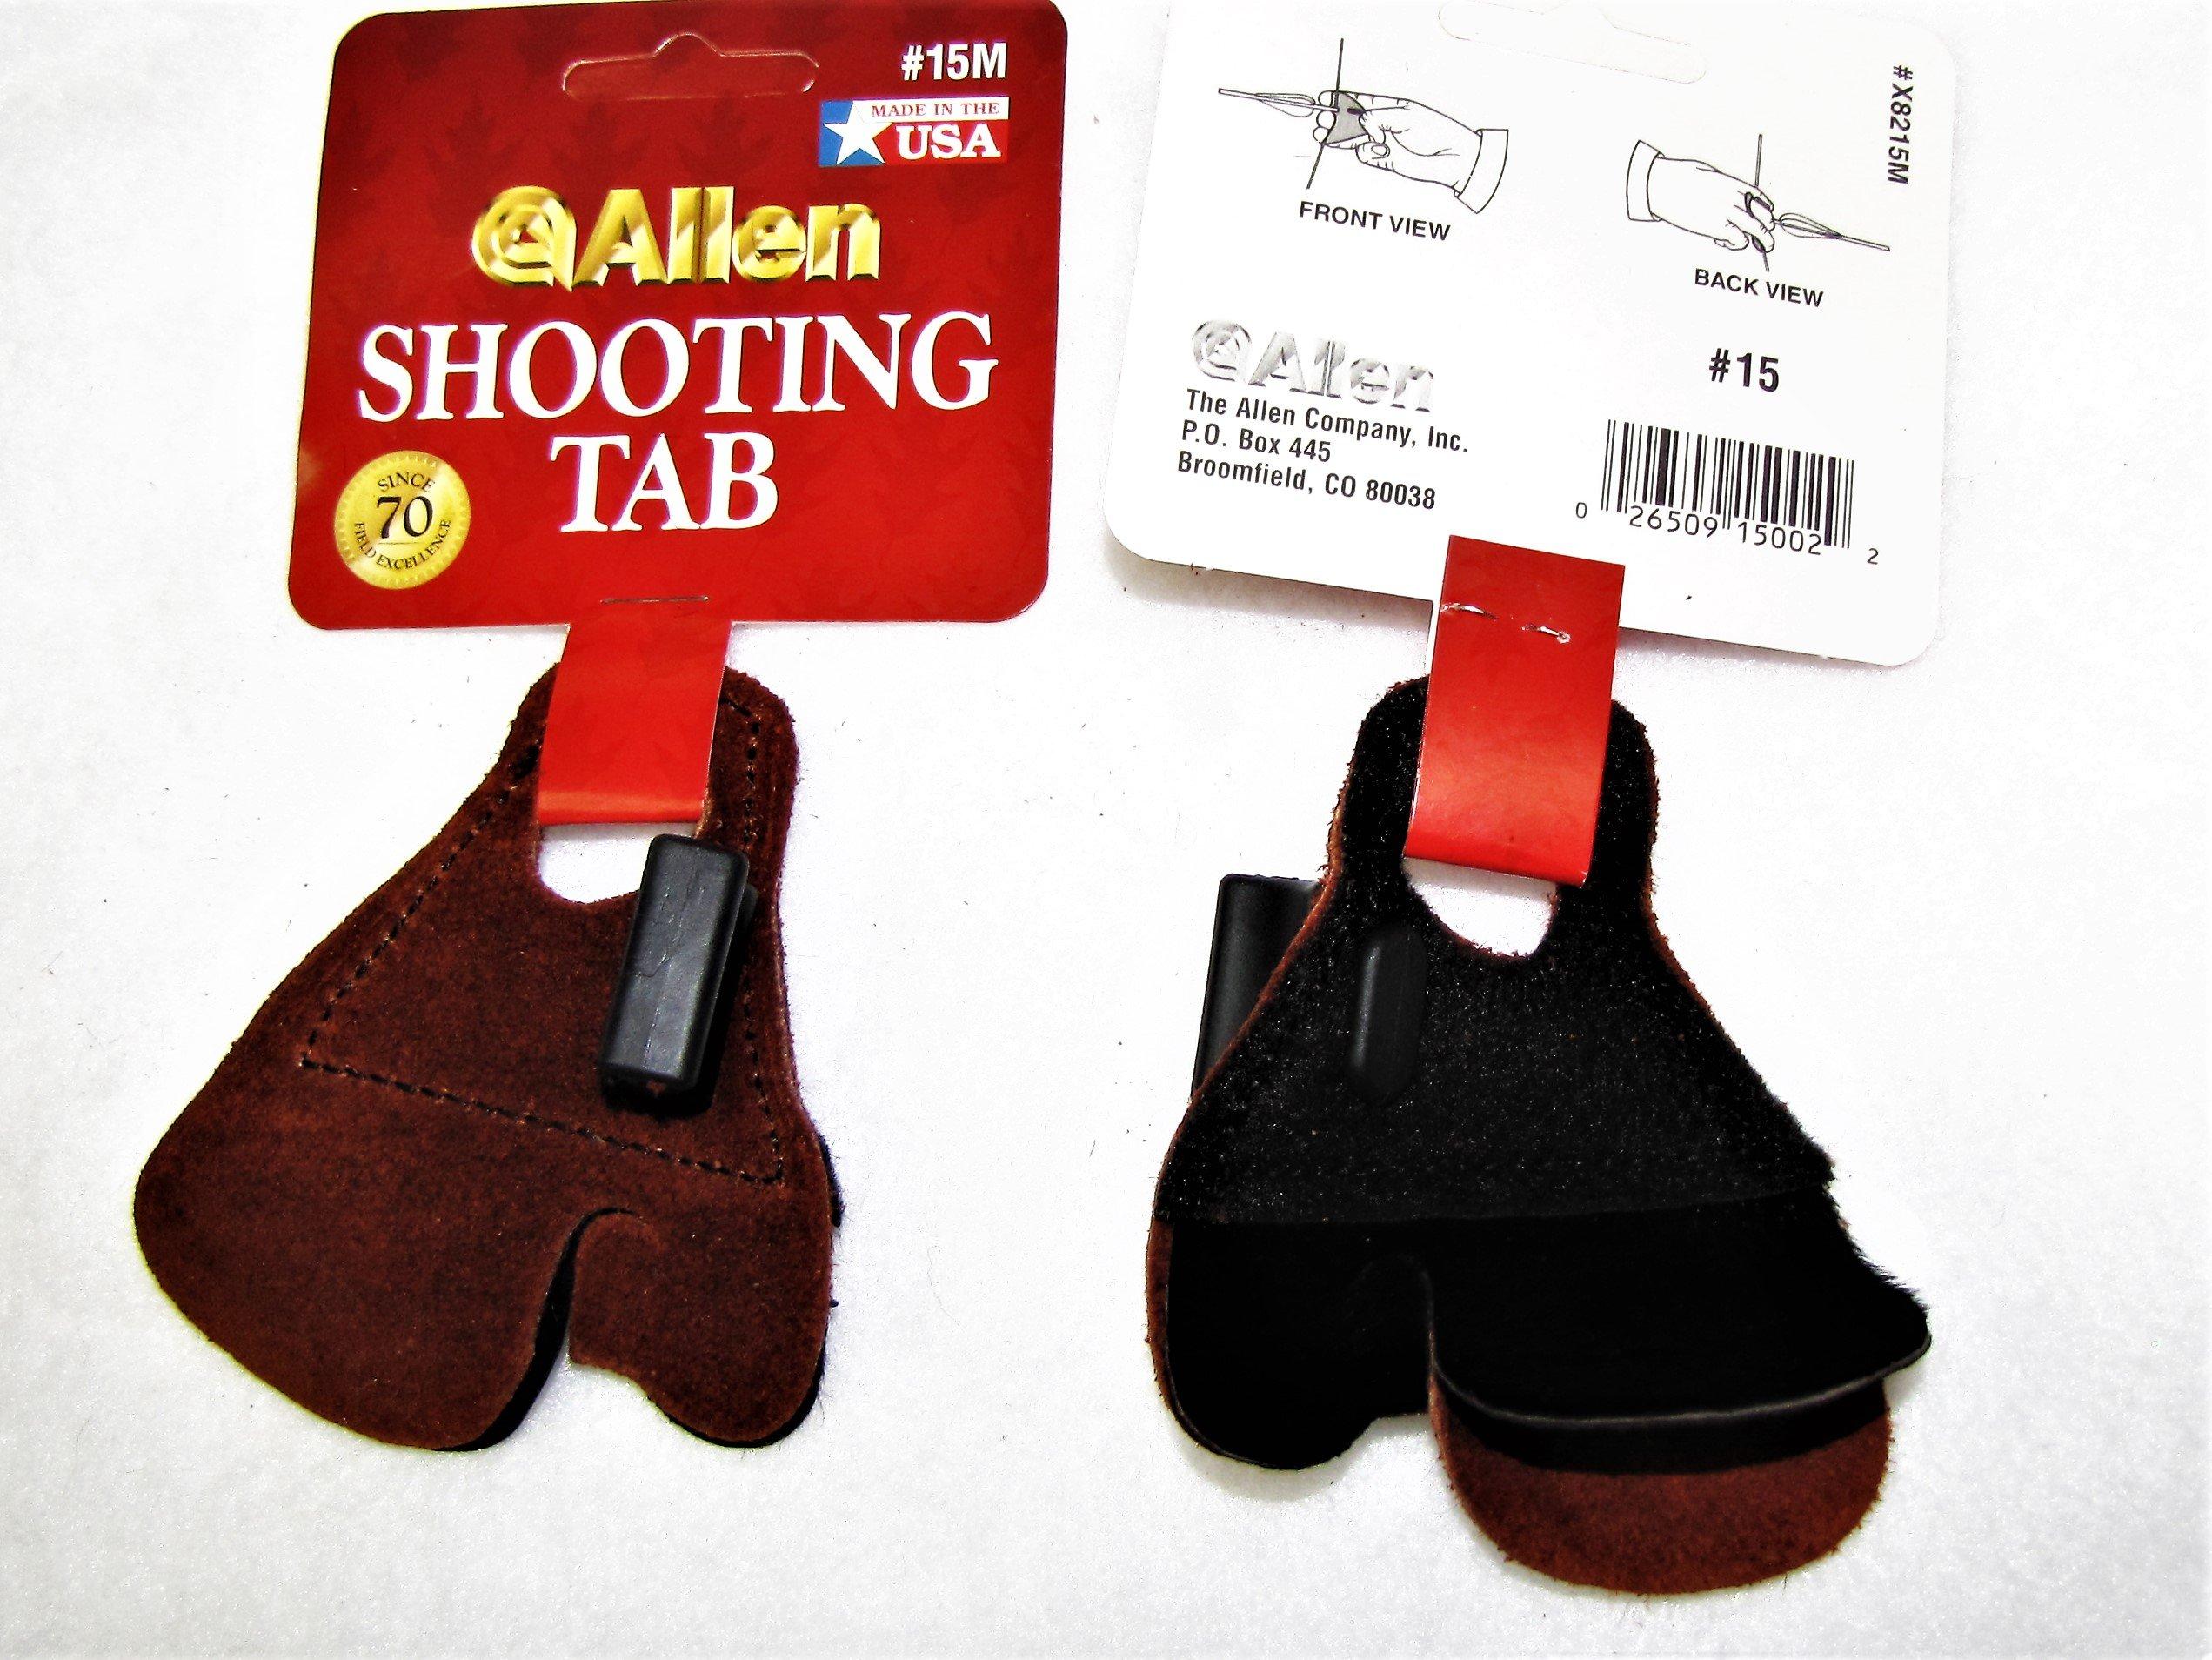 SHOOTING TABS, ALLEN CALF HAIR NO PINCH, R OR L HAND, PKG OF 6, AM 500